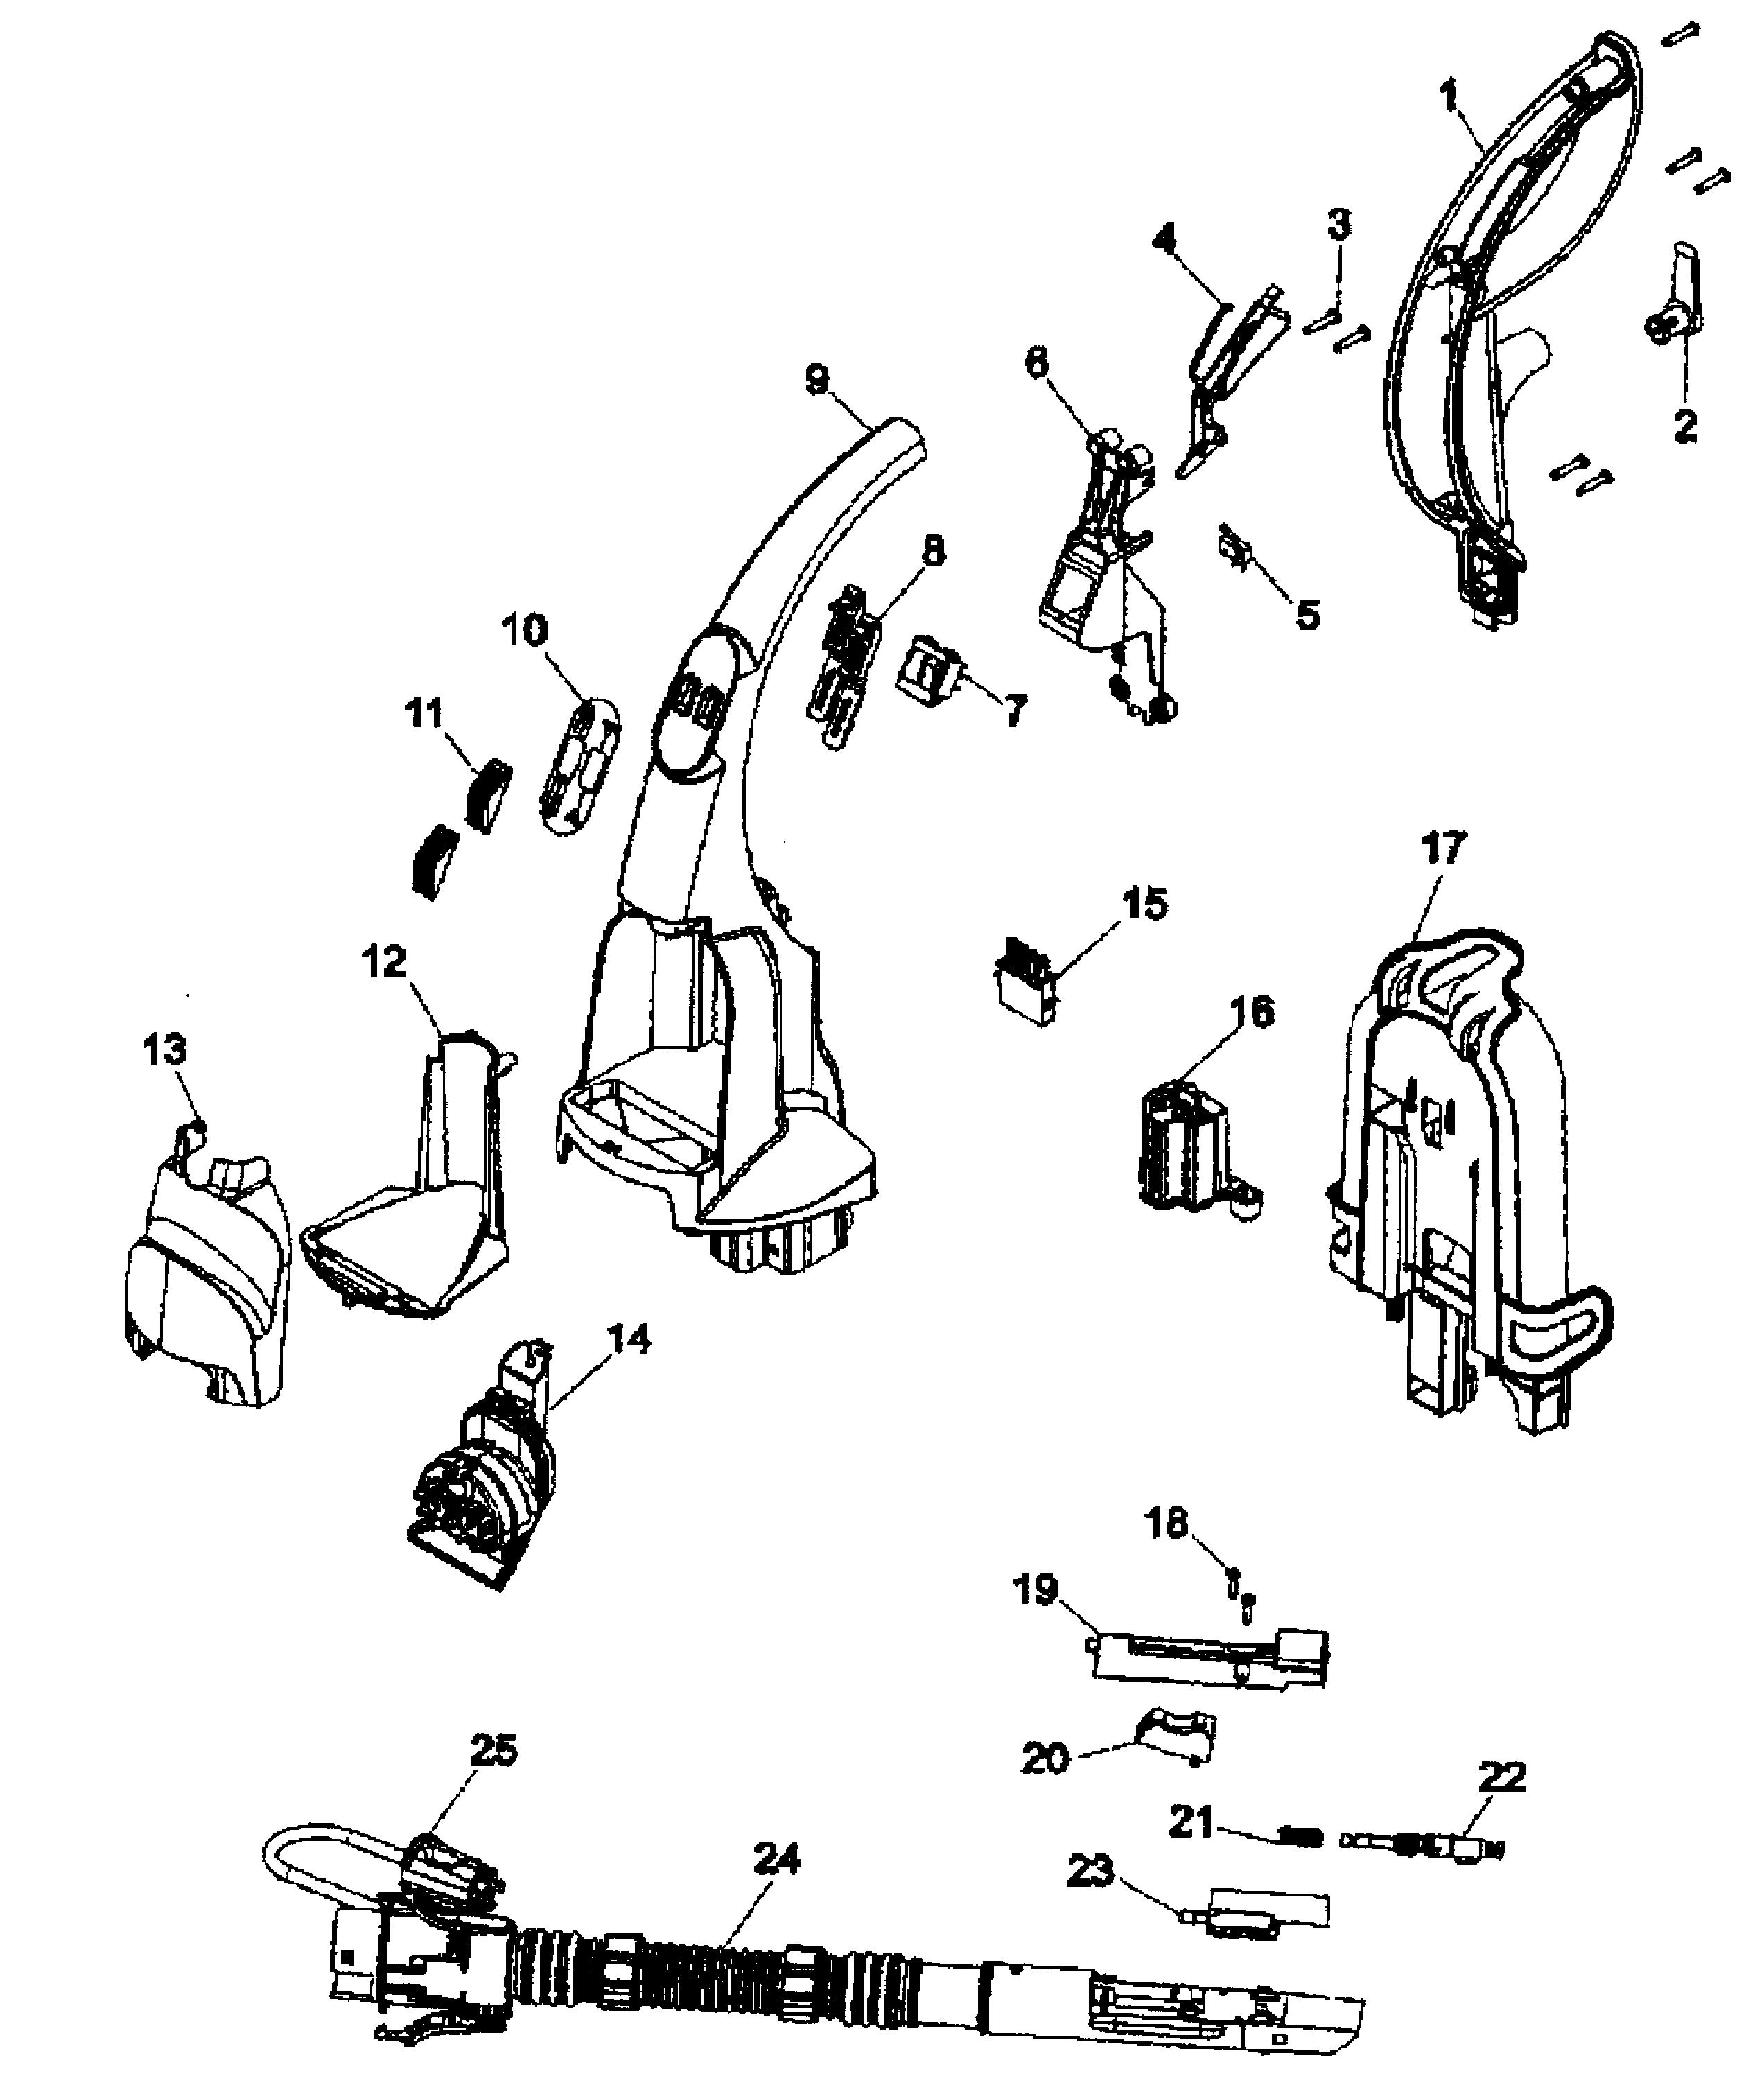 hoover dual v carpet cleaner instructions